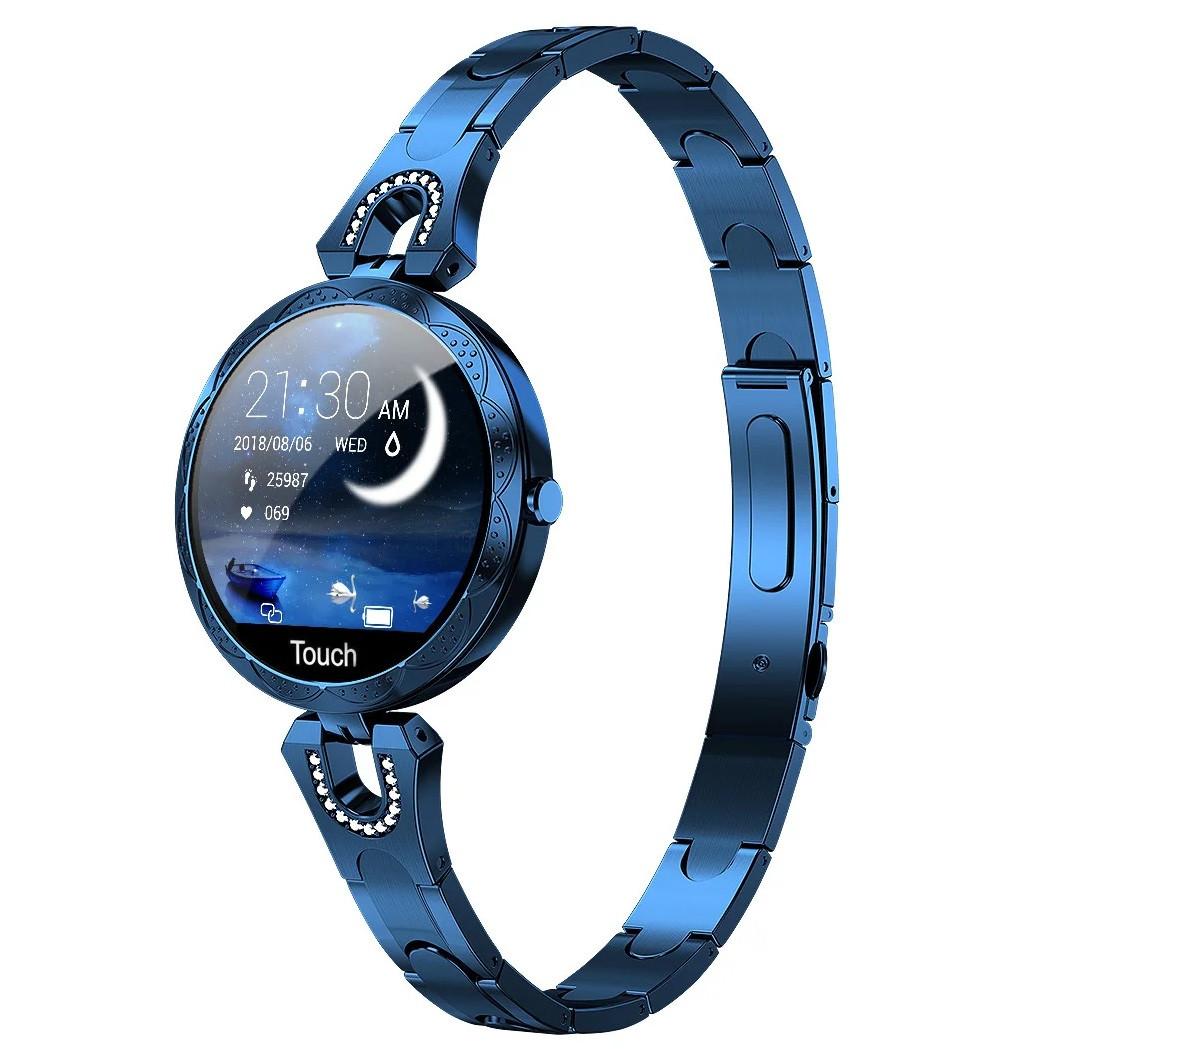 Женские умные фитнес часы Smart band Colmi AK15 Blue